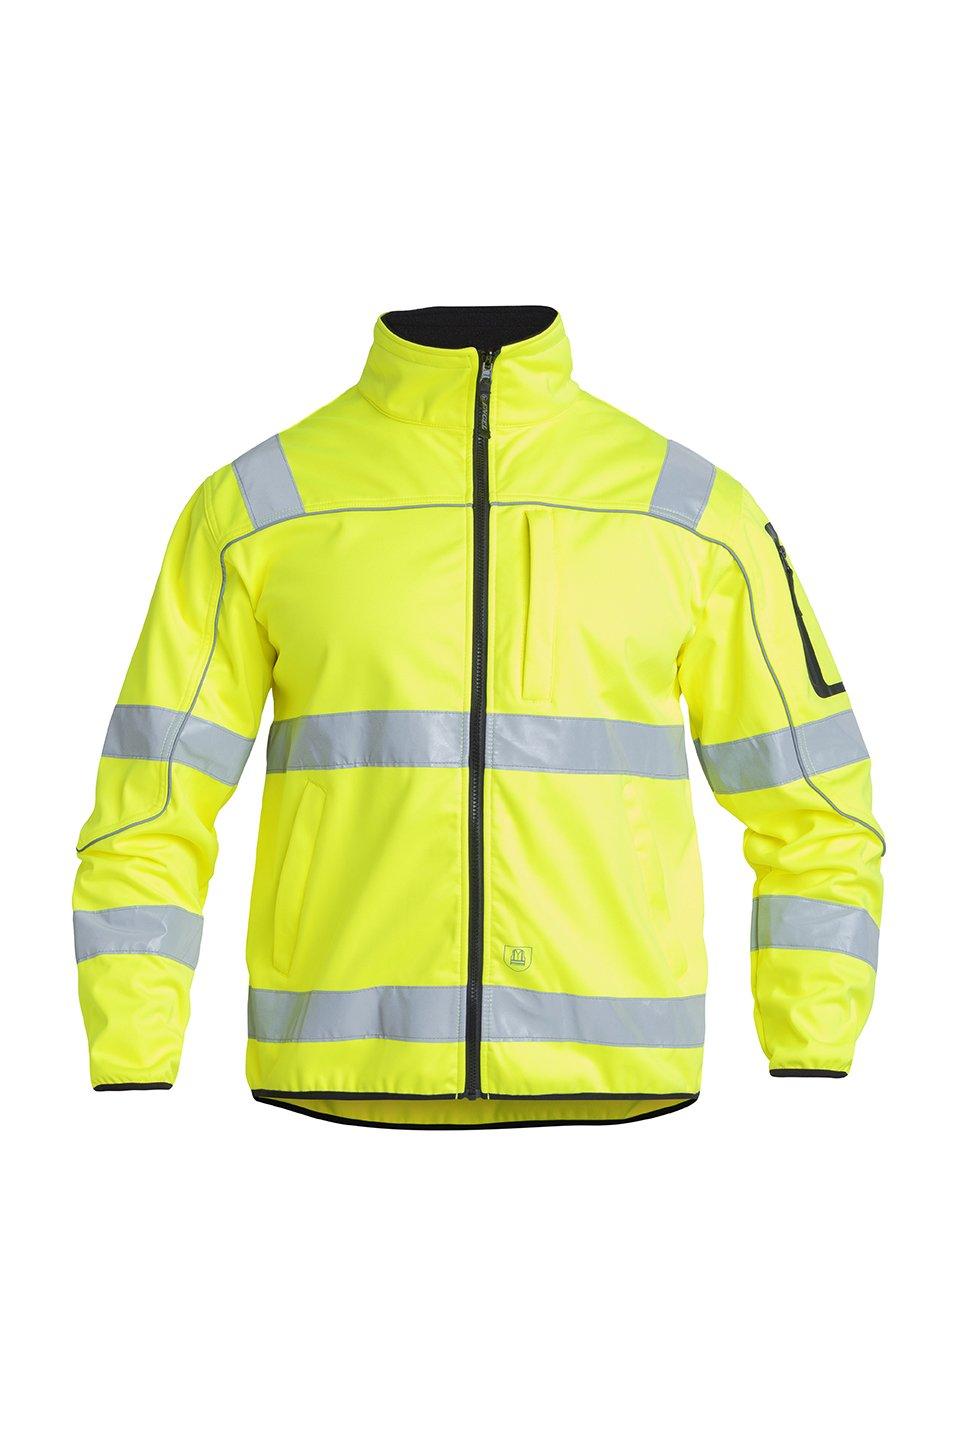 Warnschutz Softshell Jacke EN ISO 20471 Klasse 3, gelb